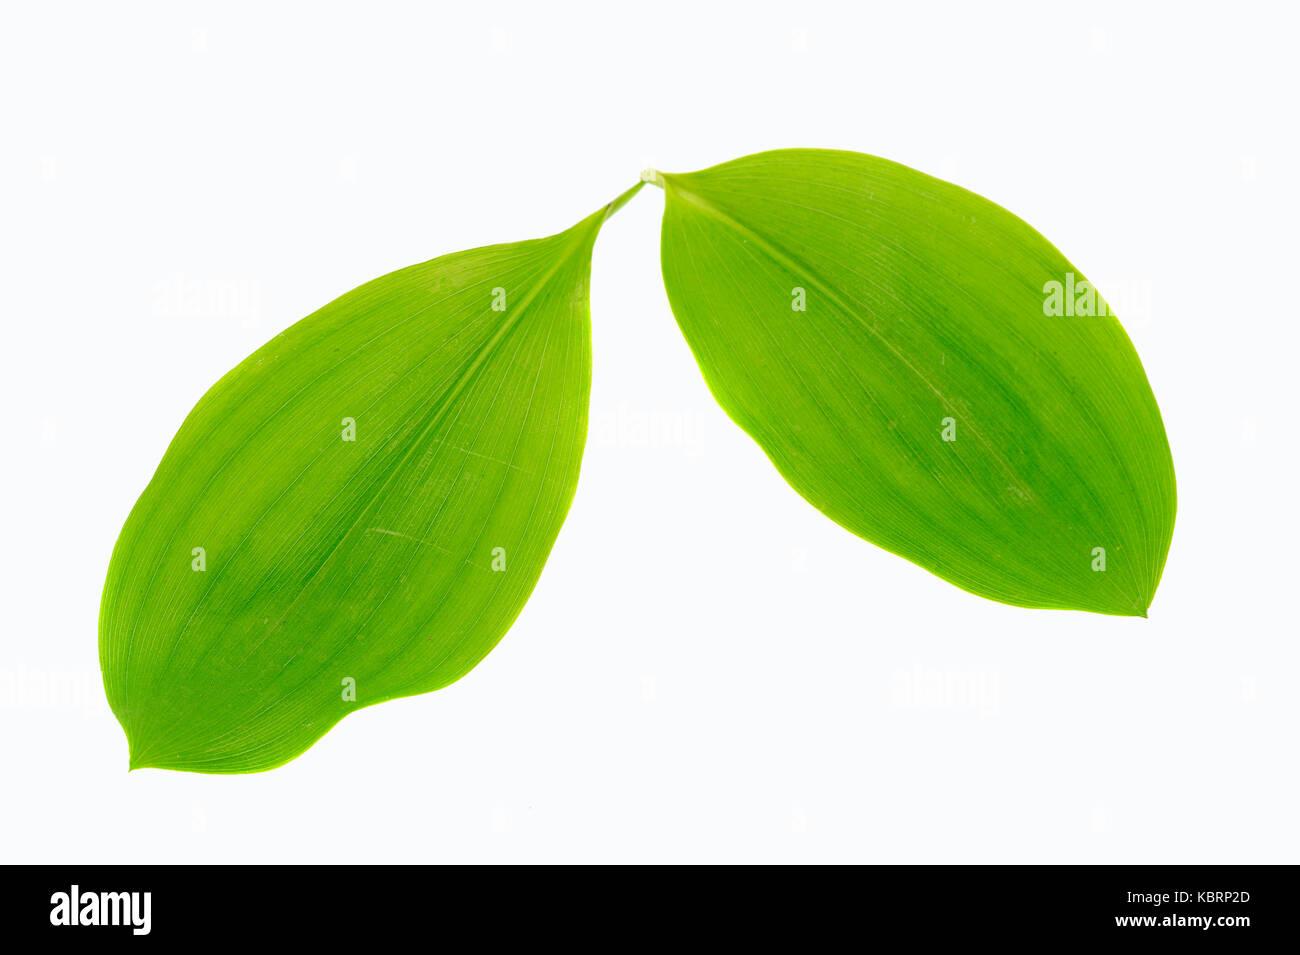 Lily of the Valley, leaves / (Convallaria majalis) | Maigloeckchen, Blaetter / (Convallaria majalis) - Stock Image